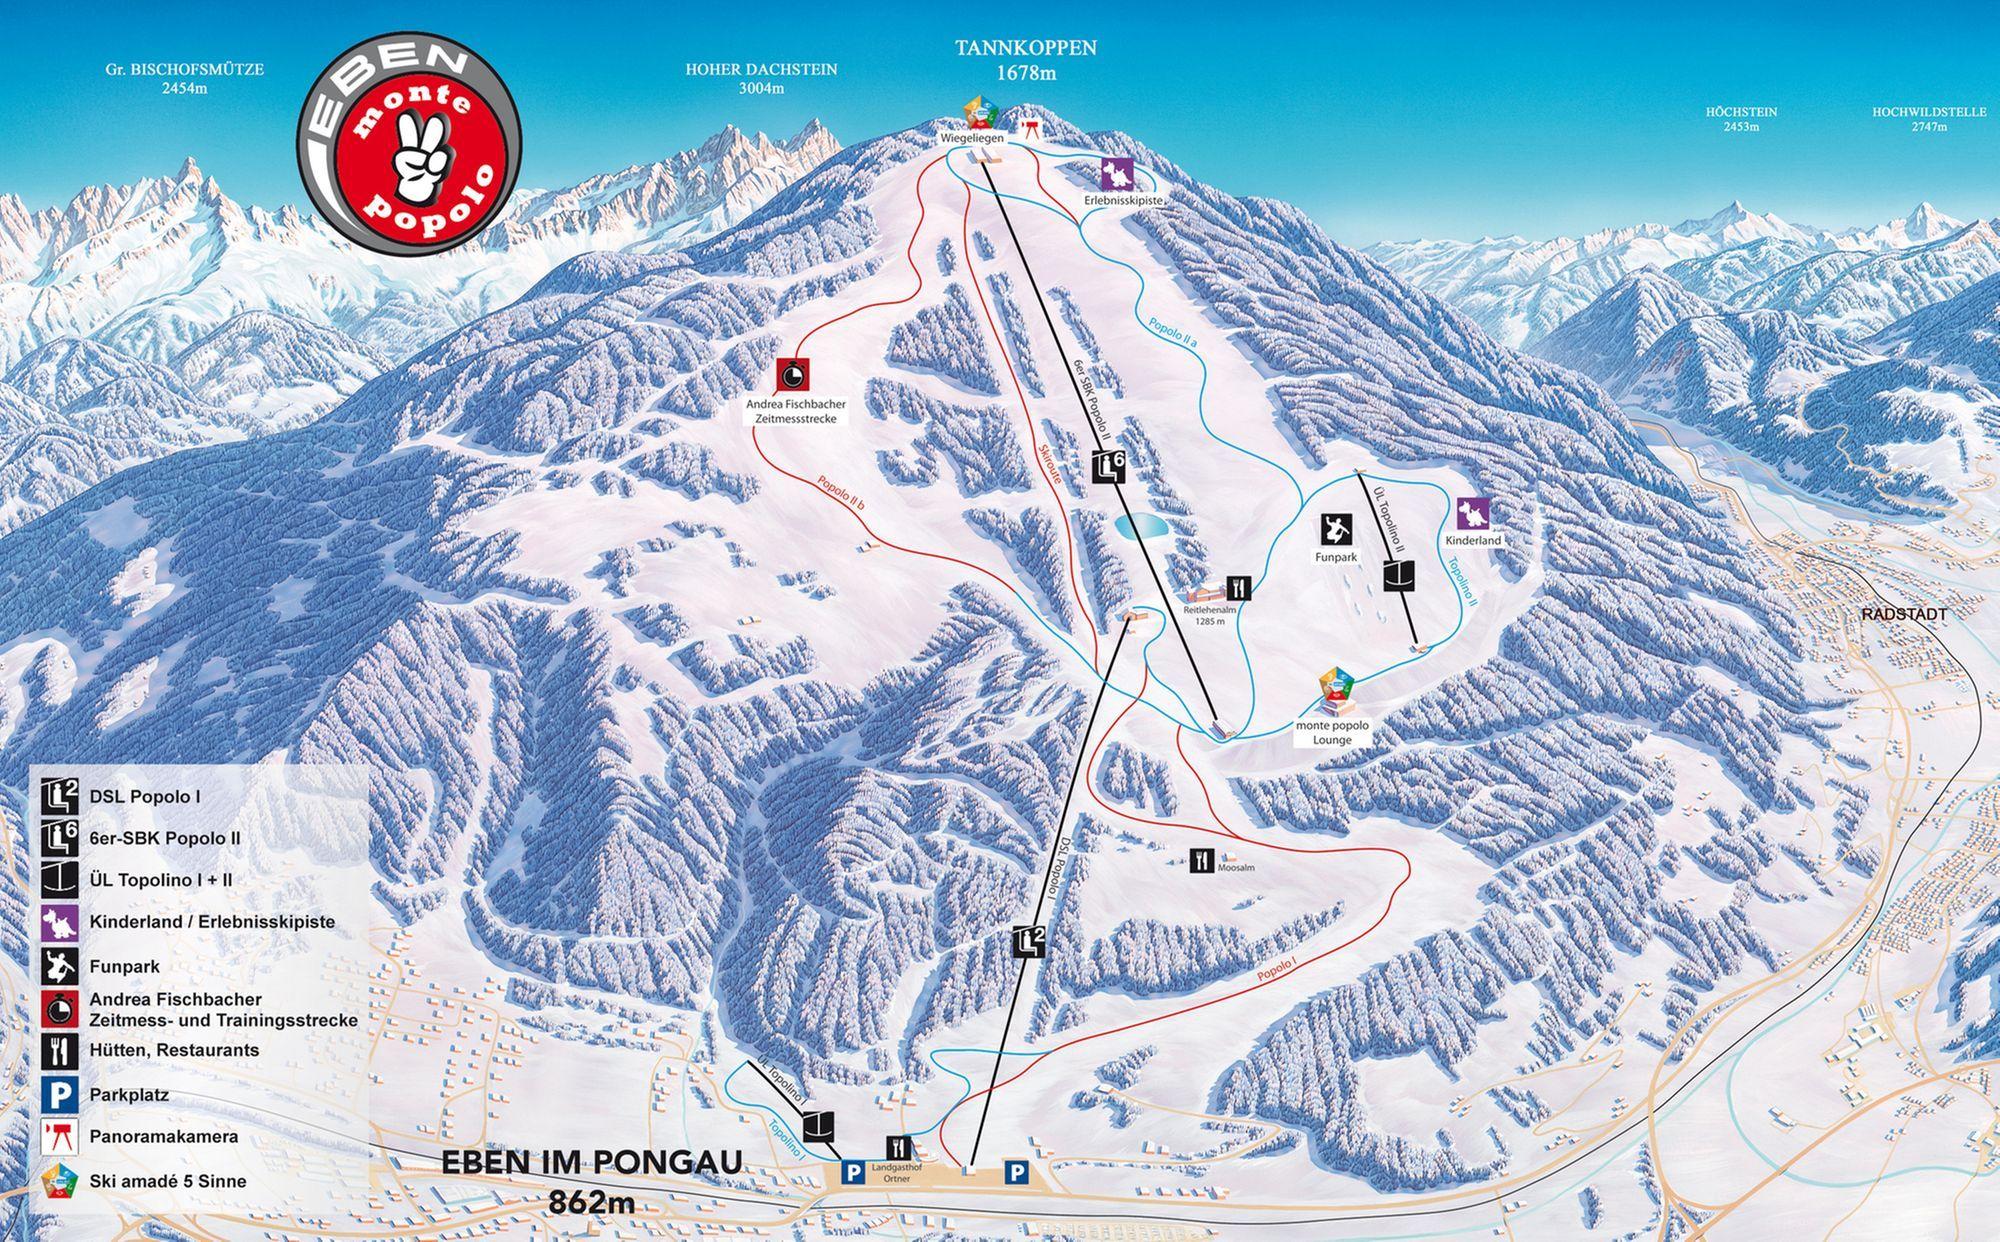 ski area eben monte popolo ski amad salzburg hotels accommodations tiscover. Black Bedroom Furniture Sets. Home Design Ideas